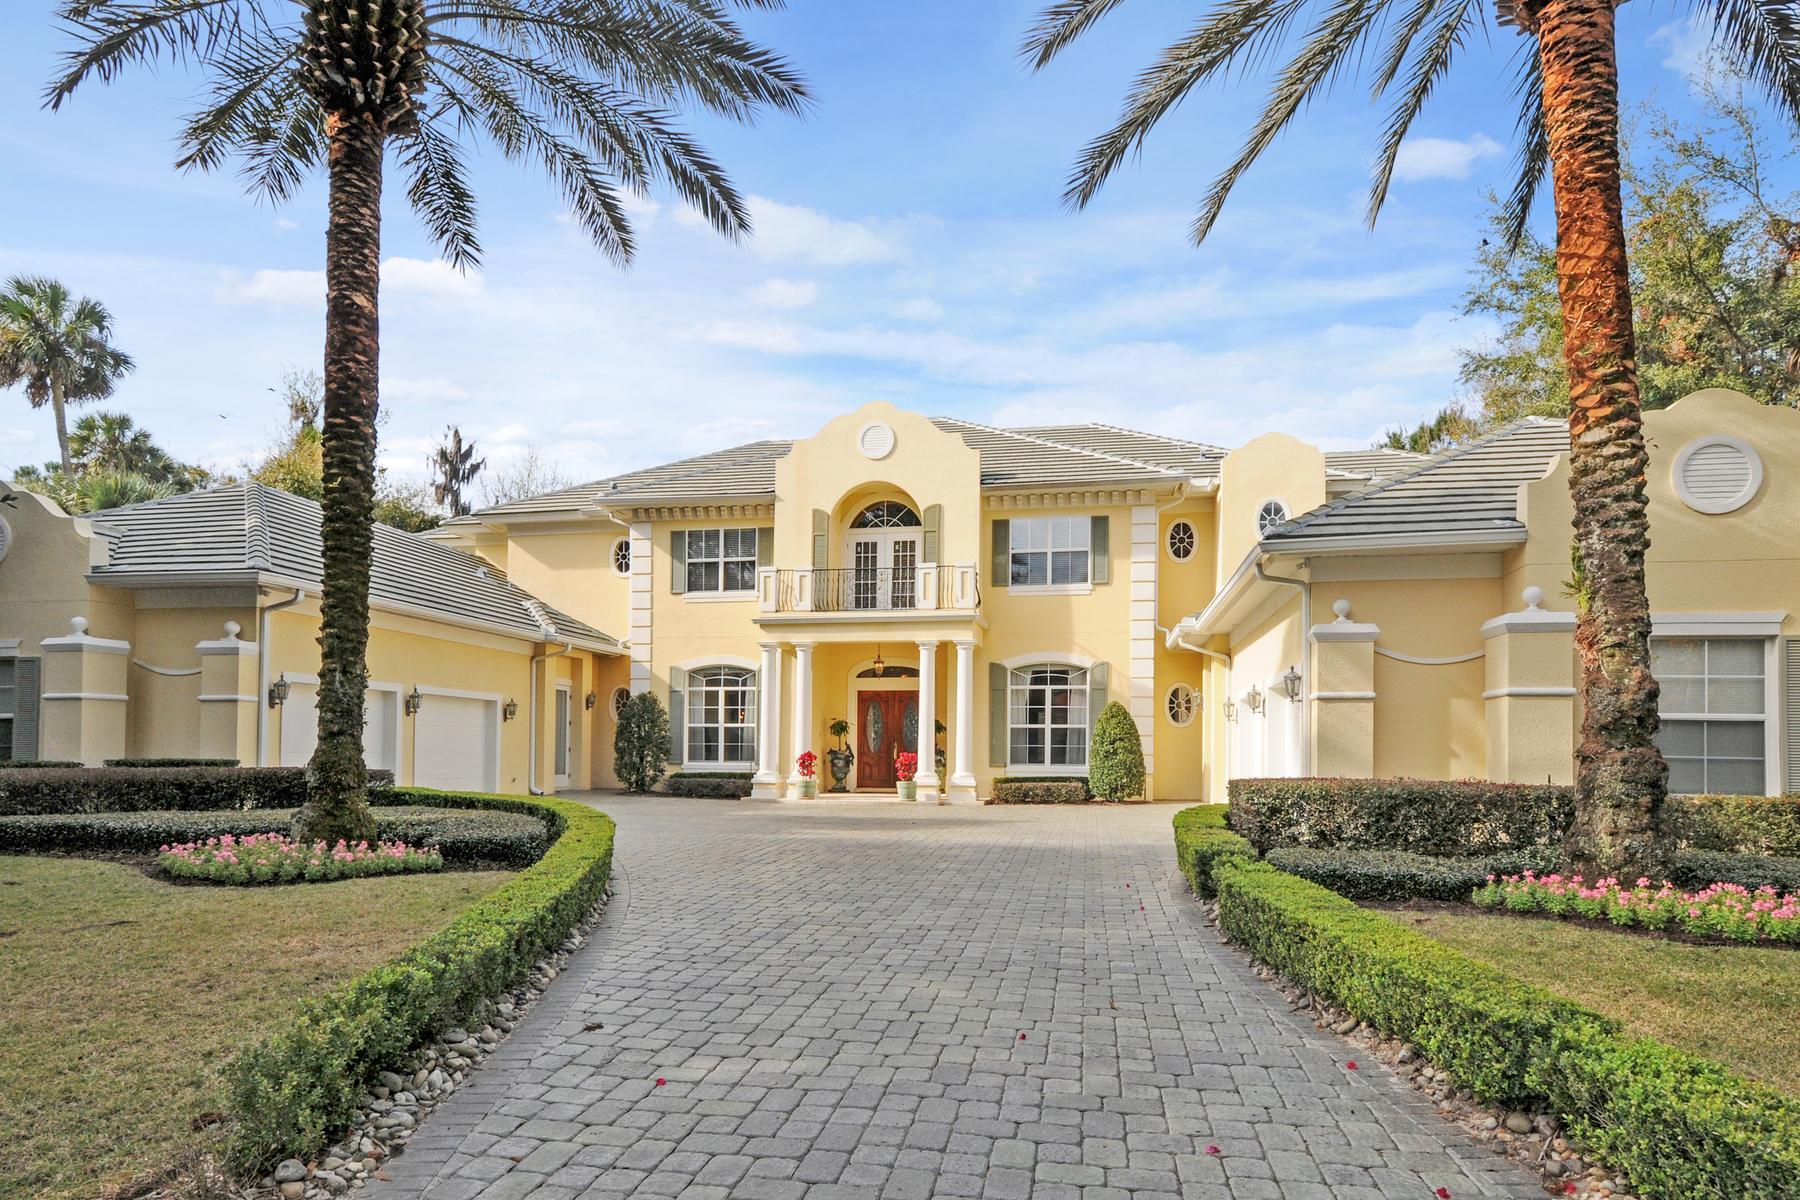 Single Family Home for Sale at Sanford, Florida Sanford, Florida 32771 United States